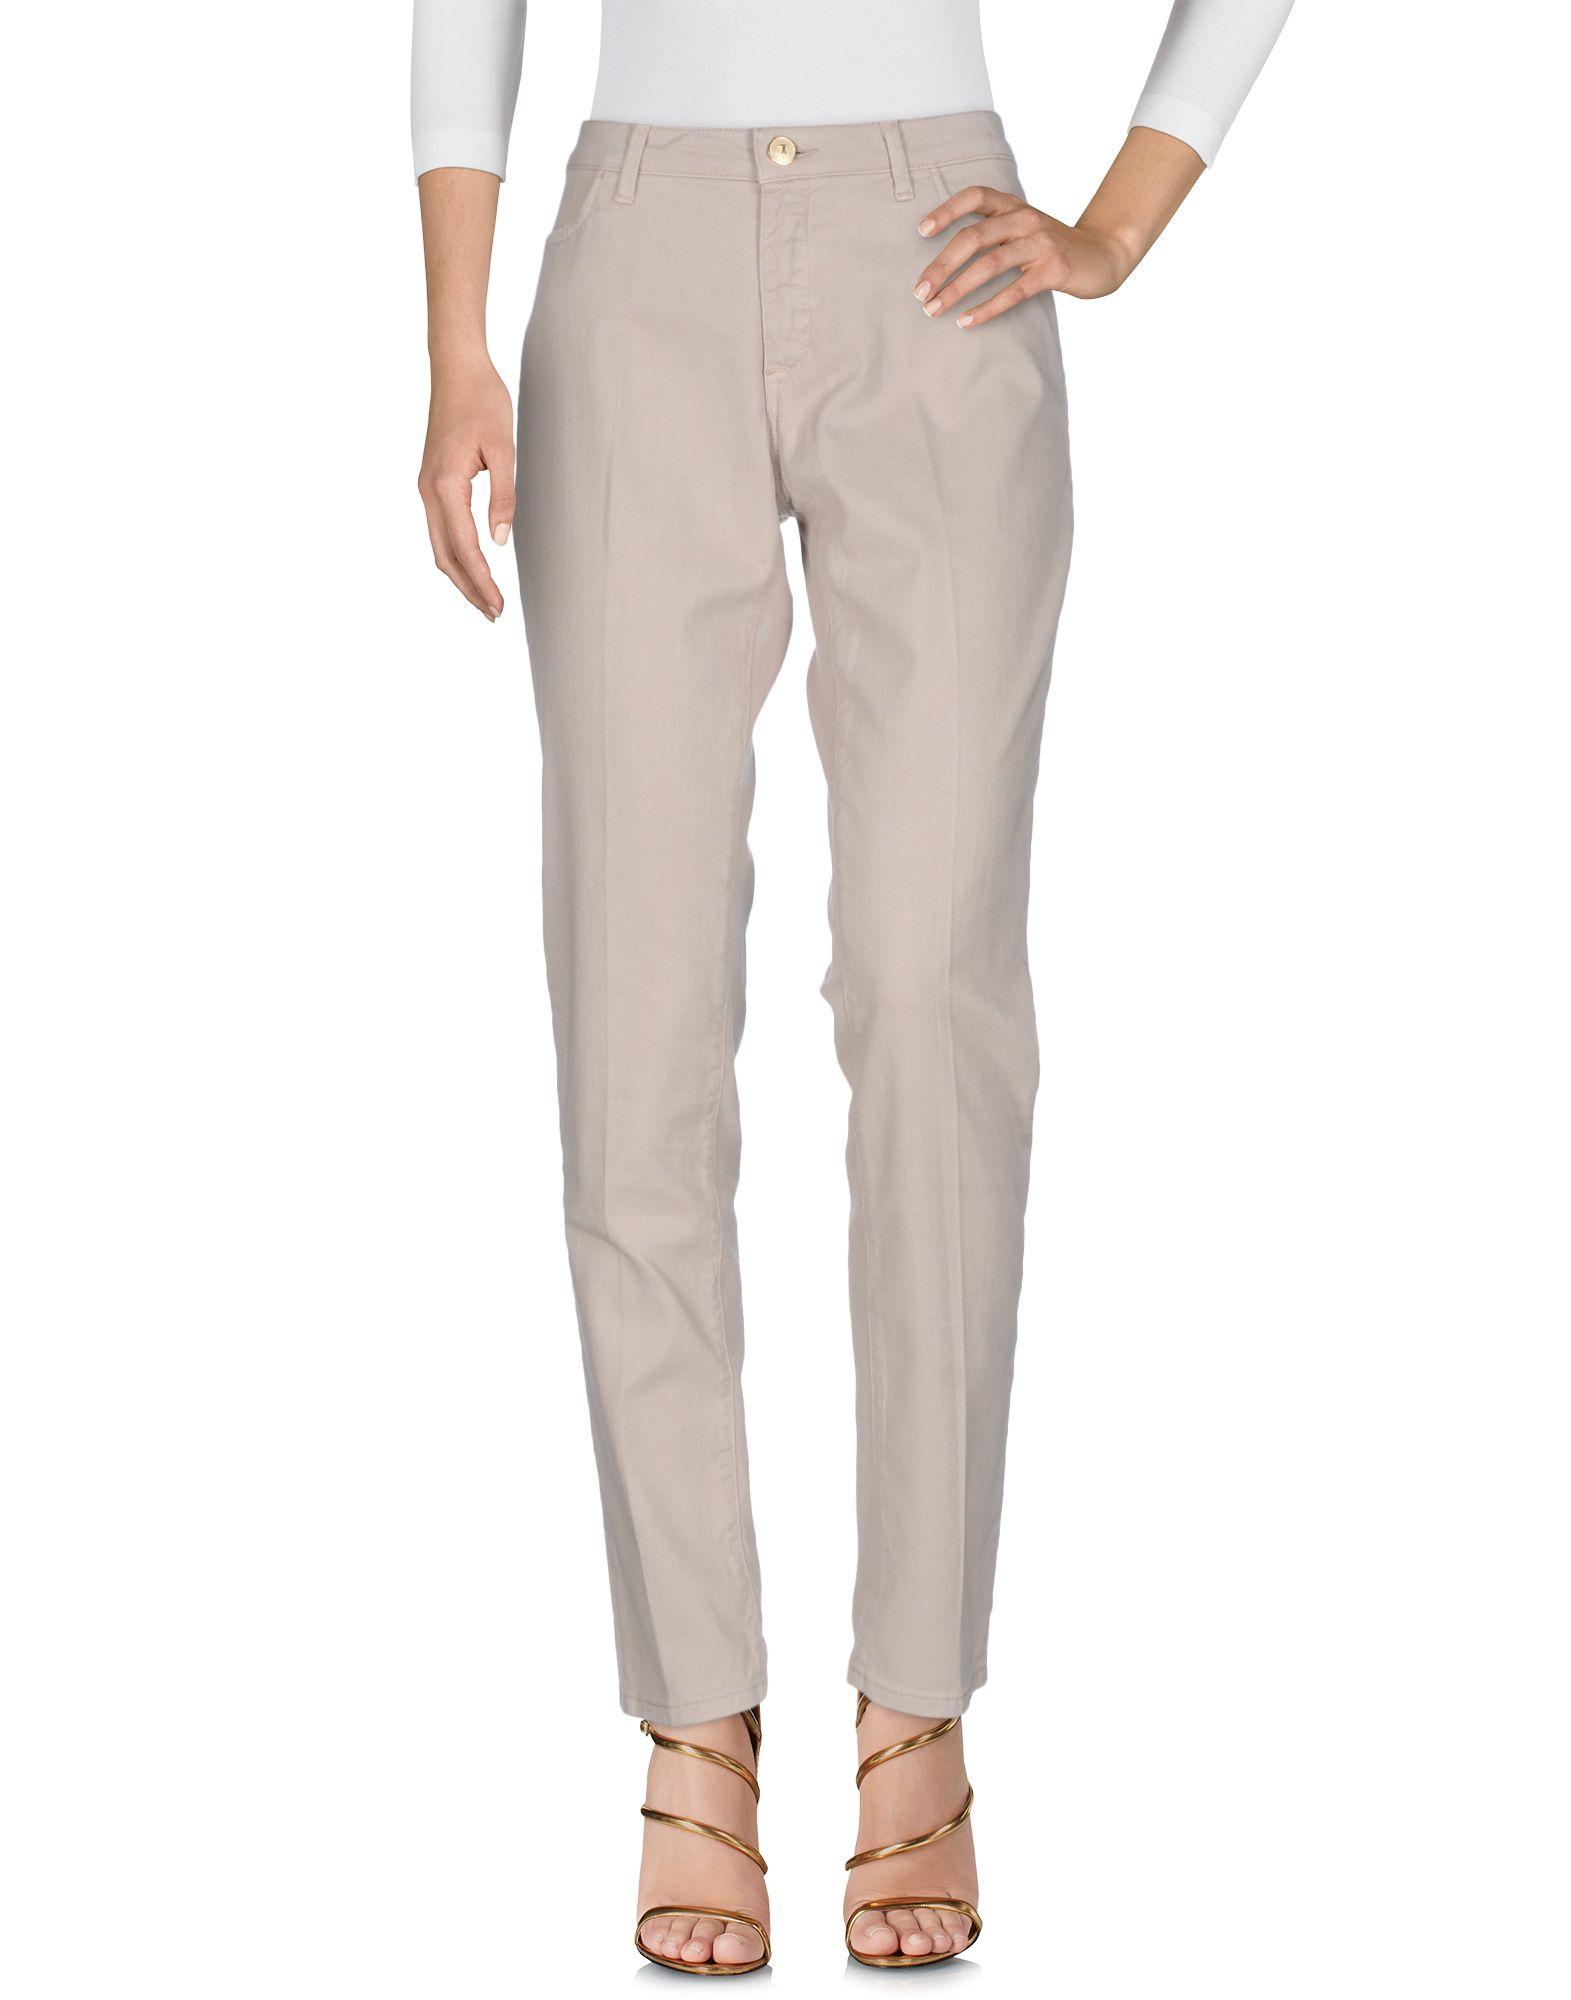 TRUSSARDI JEANS Damen Jeanshose Farbe Beige Größe 10 jetztbilligerkaufen